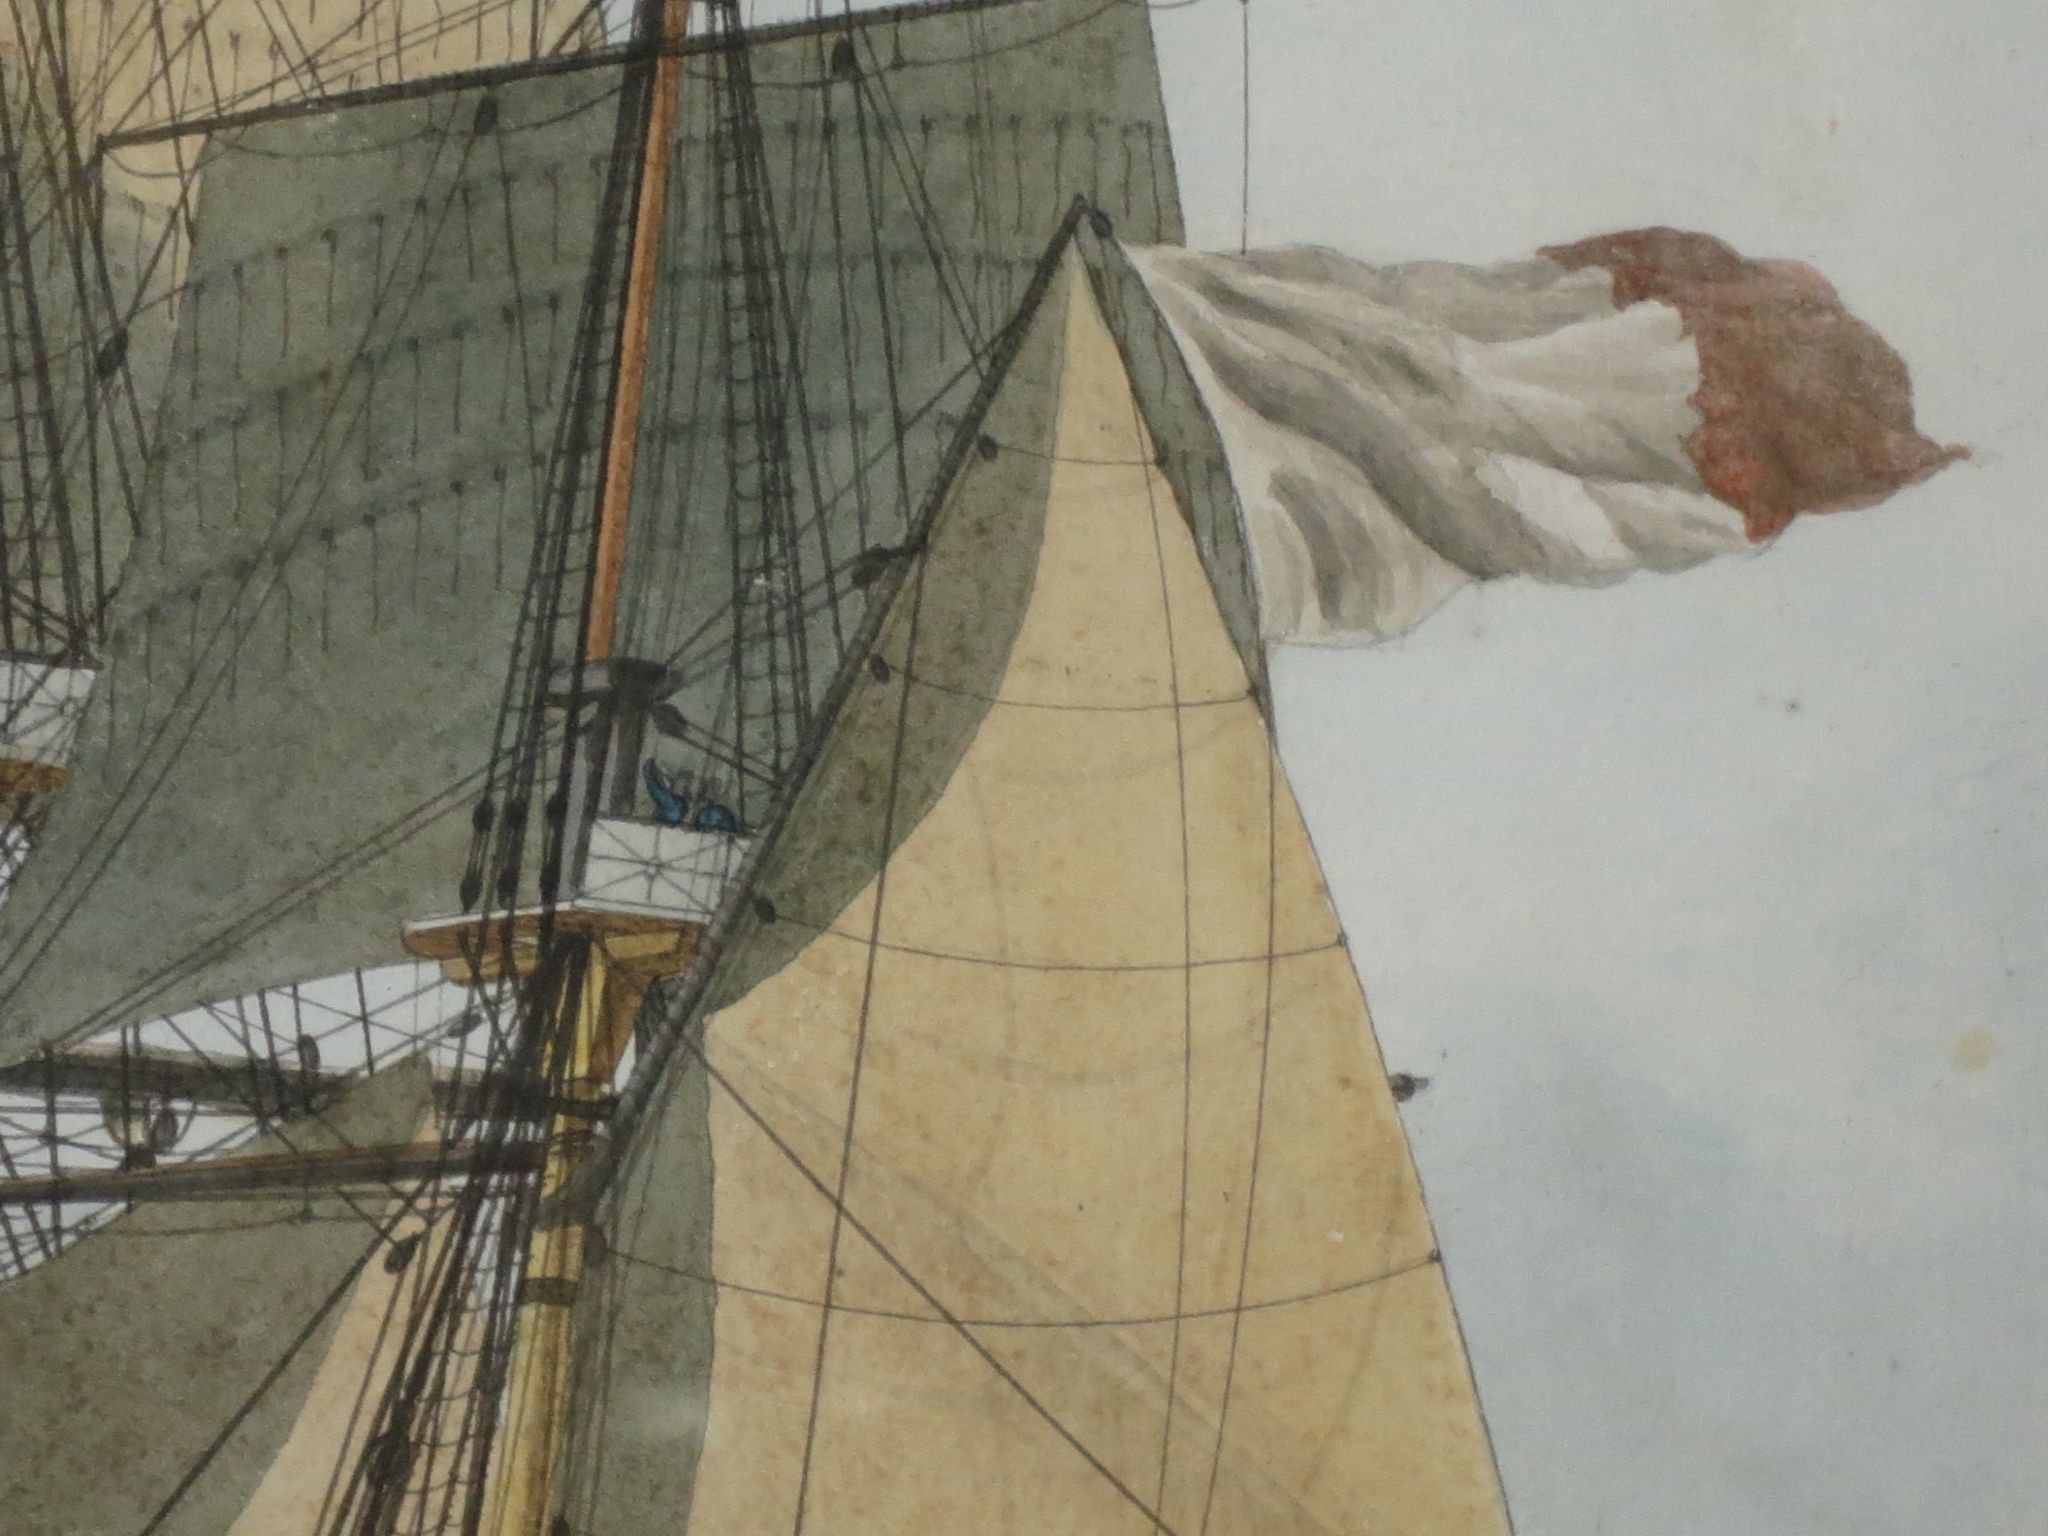 JOSEPH-ANGE ANTOINE ROUX (FRENCH, 1765-1835) - Image 5 of 15